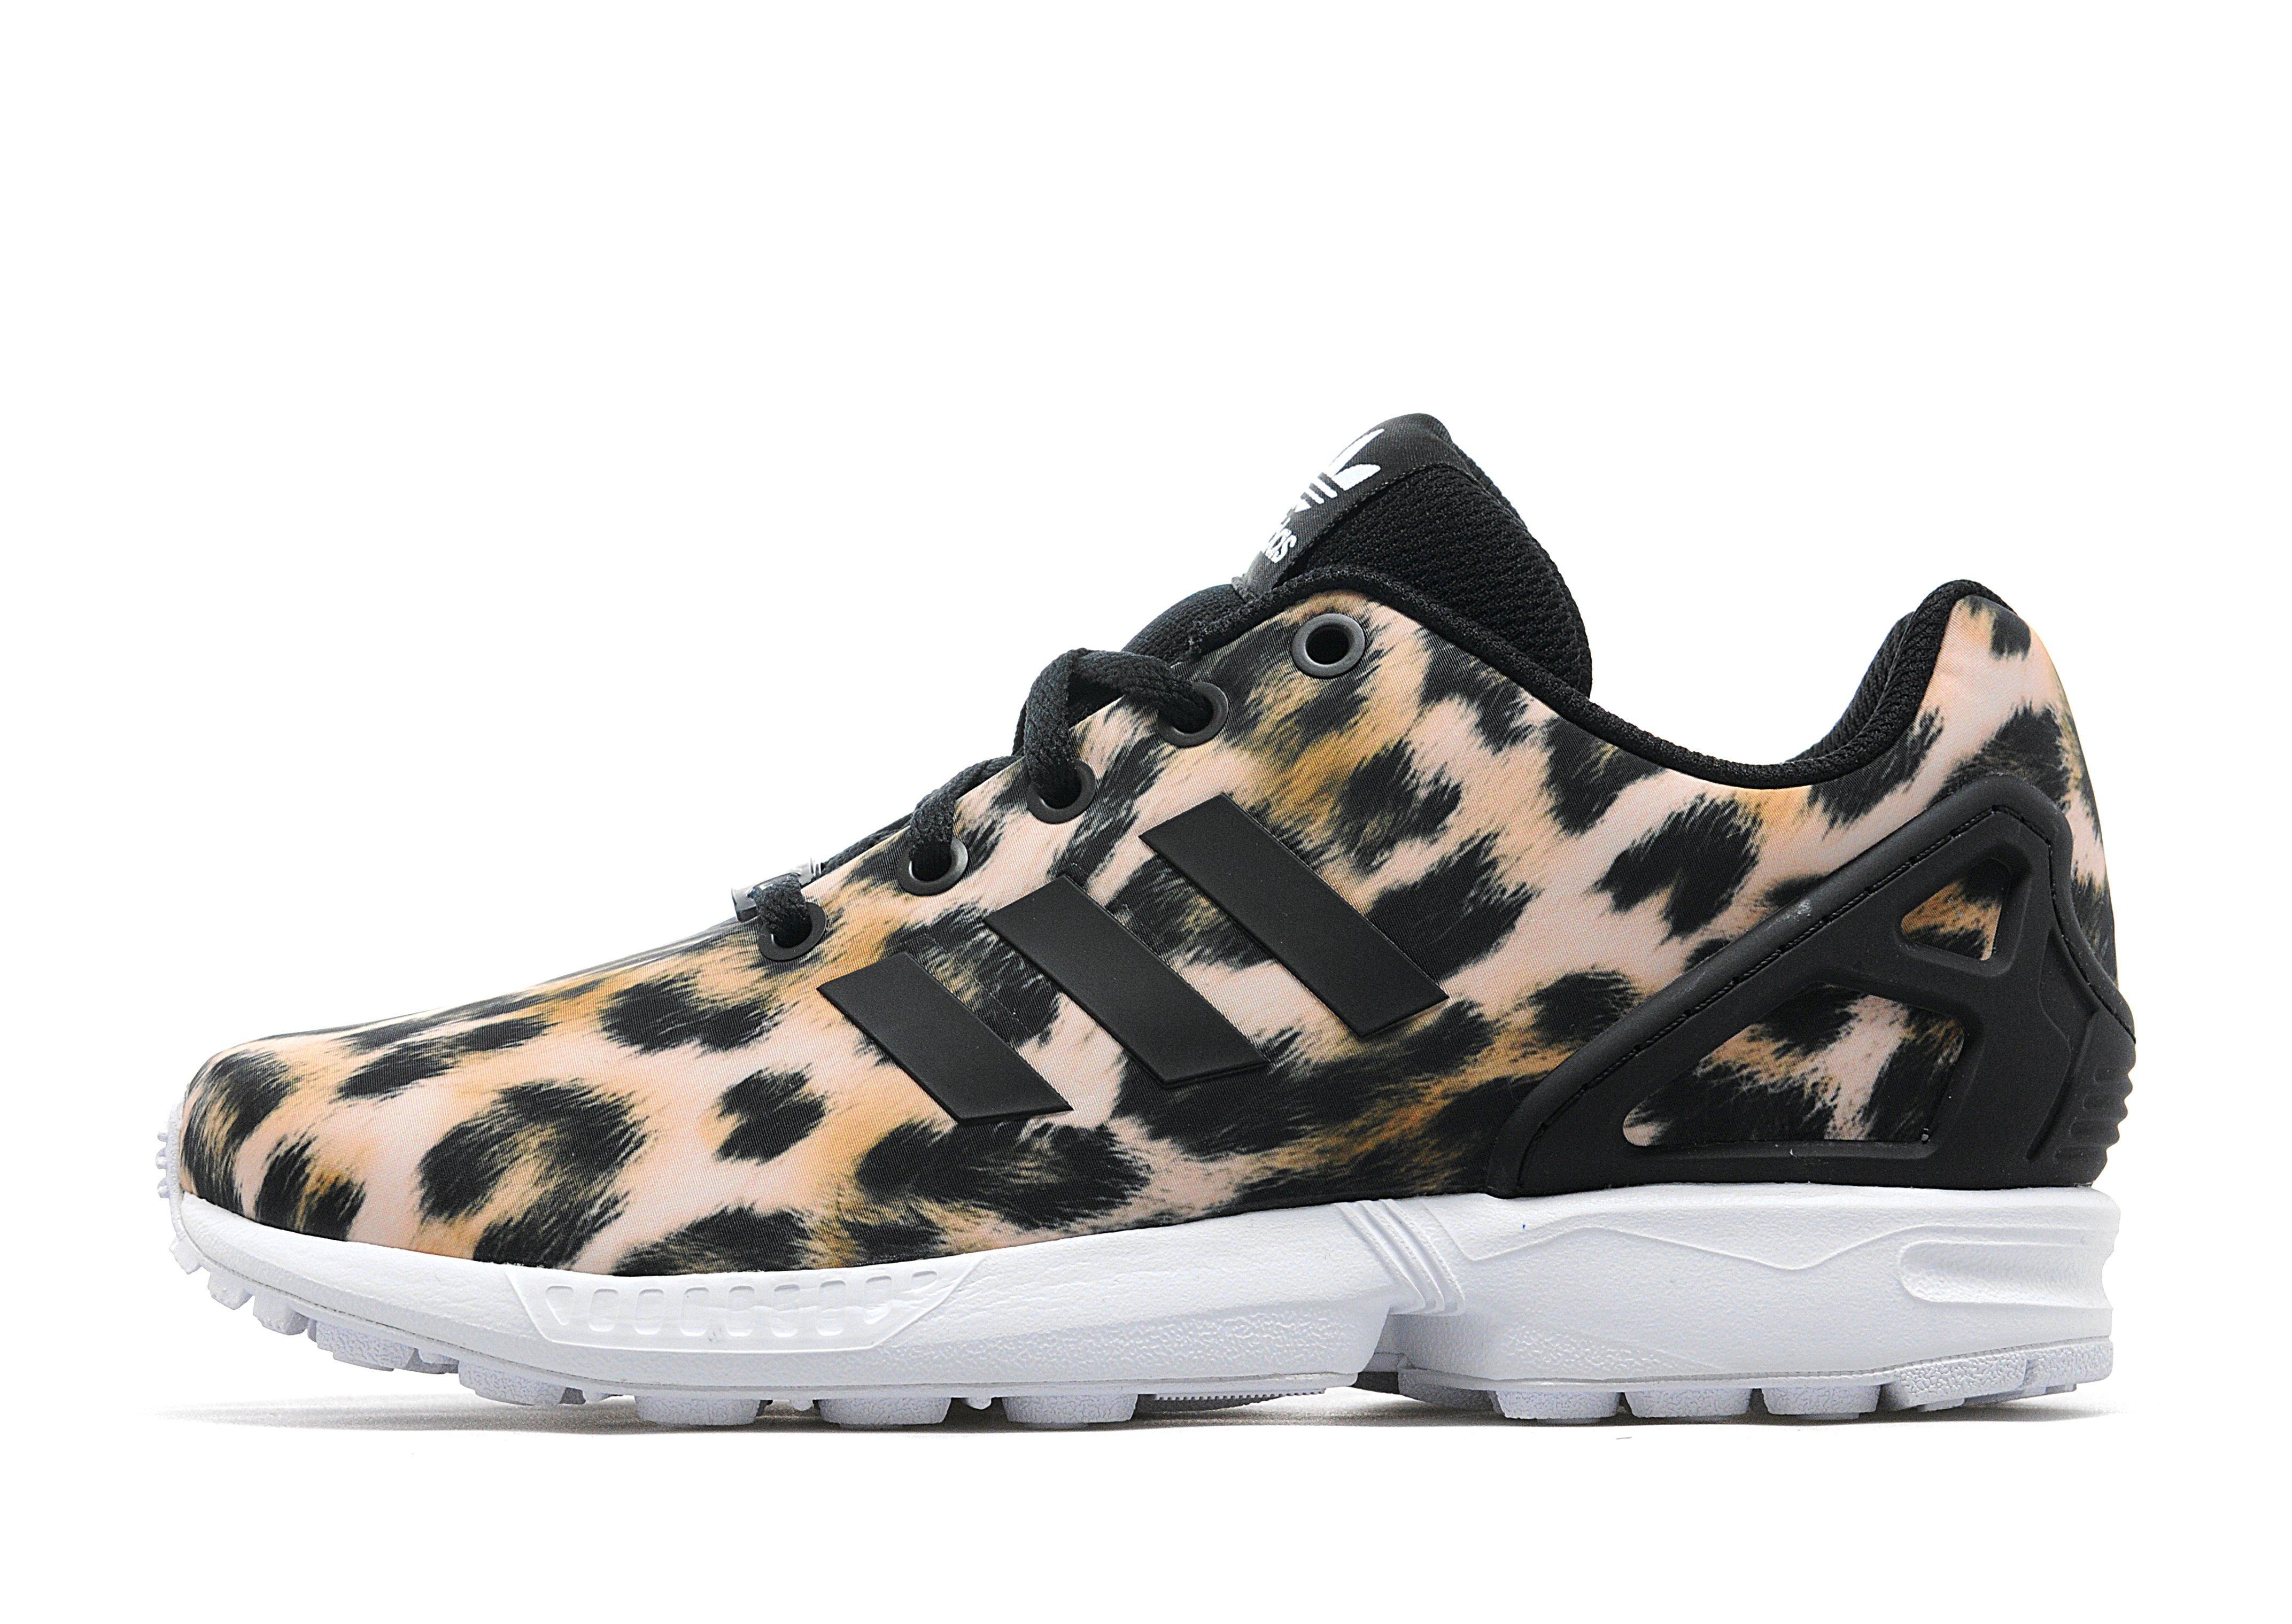 adidas zx flux torsion leopard print. Black Bedroom Furniture Sets. Home Design Ideas